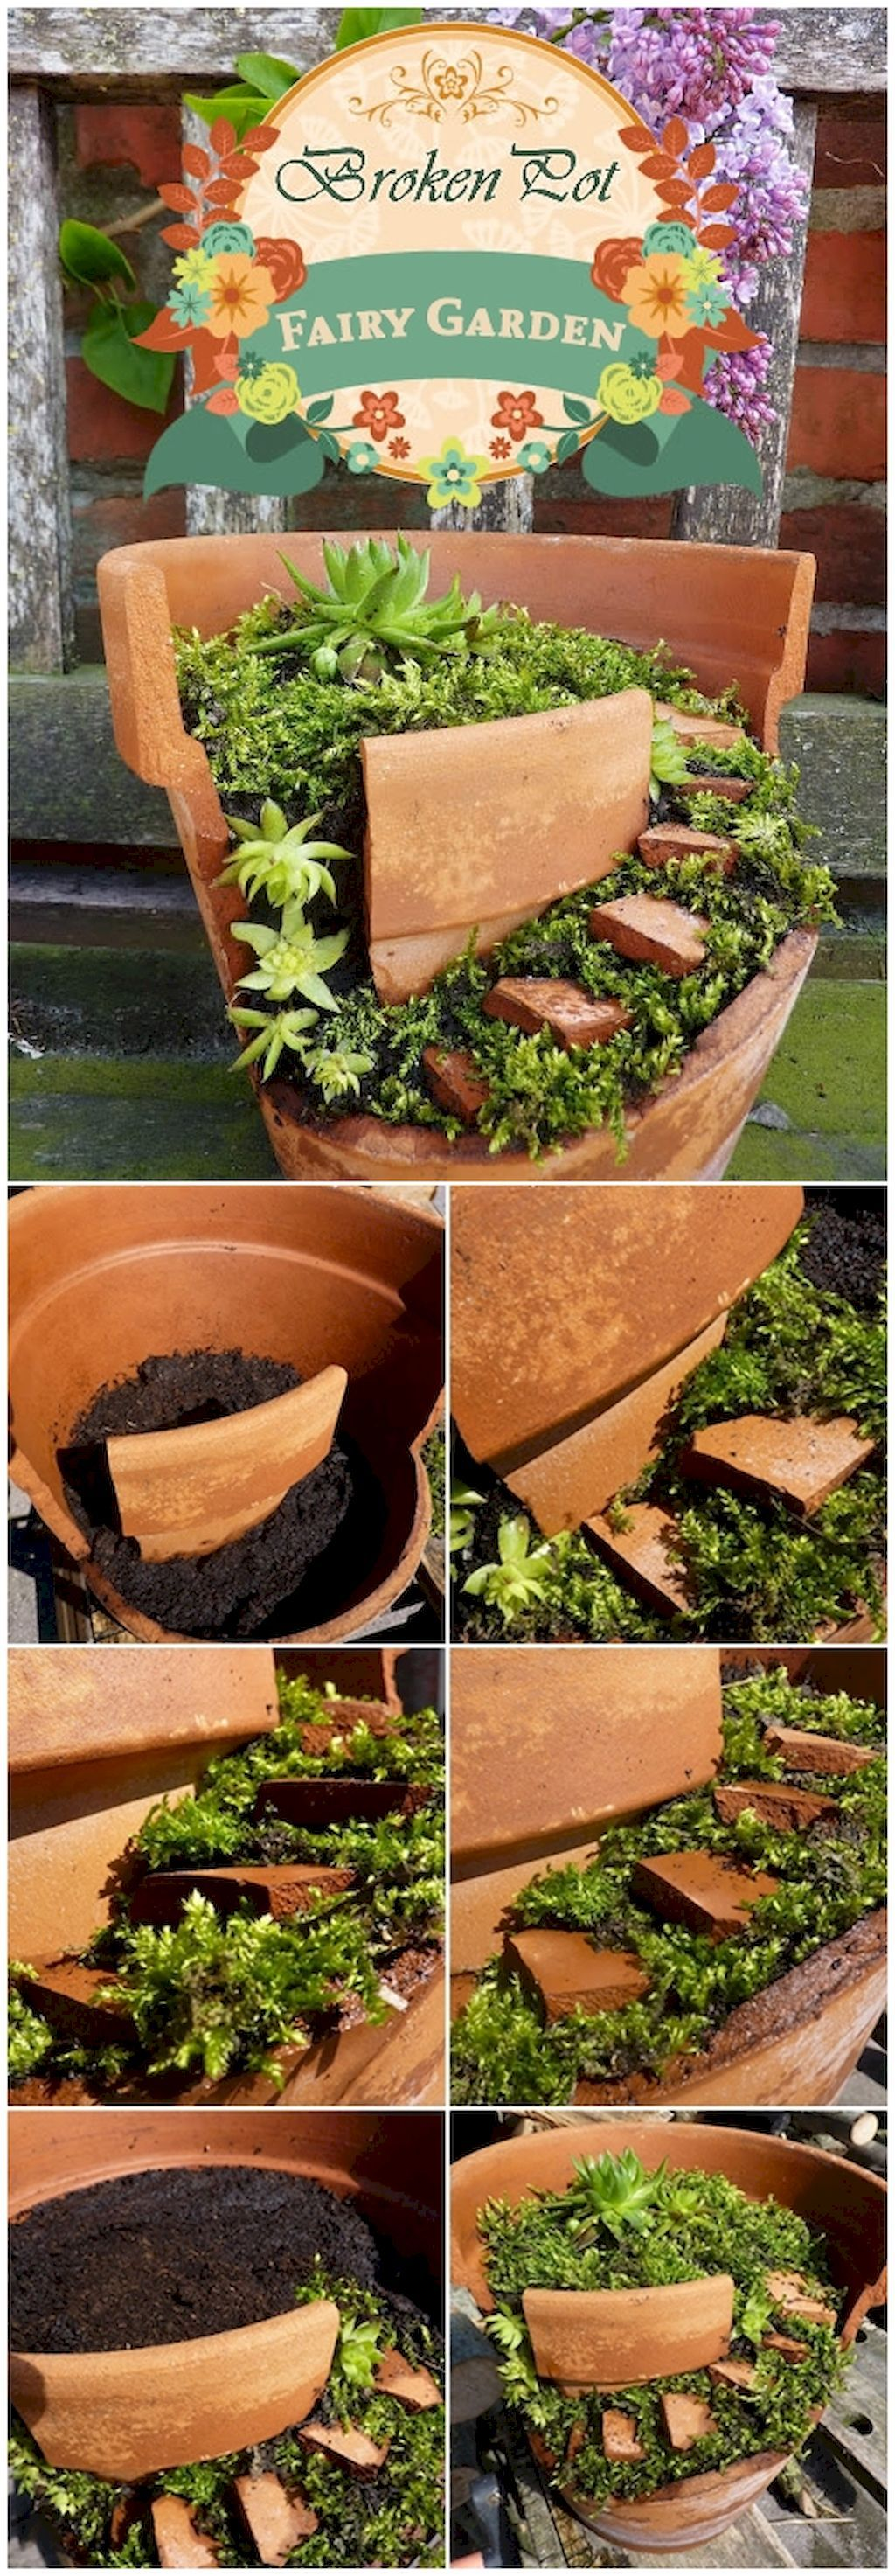 Marvelous Gardens 50 Mini Fairy Garden Ideas Diy Miniature Fairy Garden Ideas Garden Diy Miniature Fairy Garden Ideas Miniatures